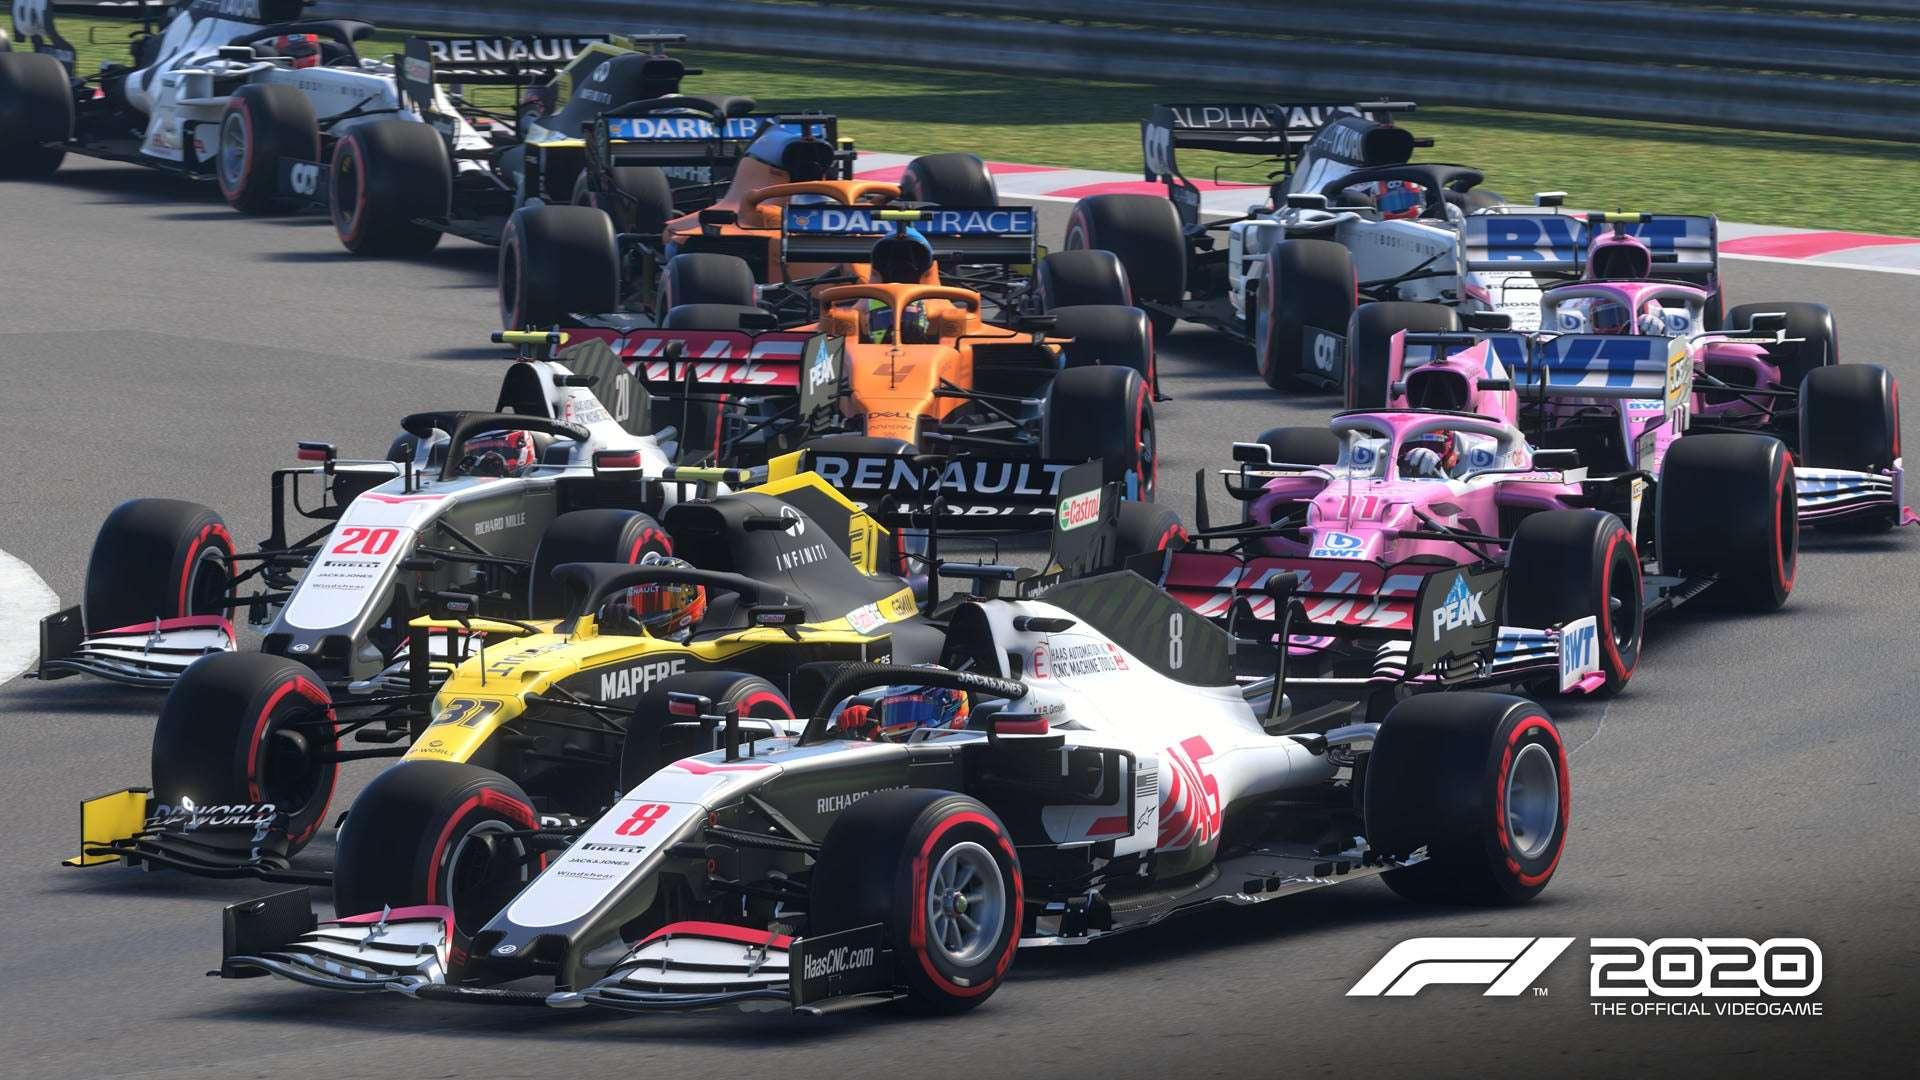 F1 2020 Formula 1 Codemasters